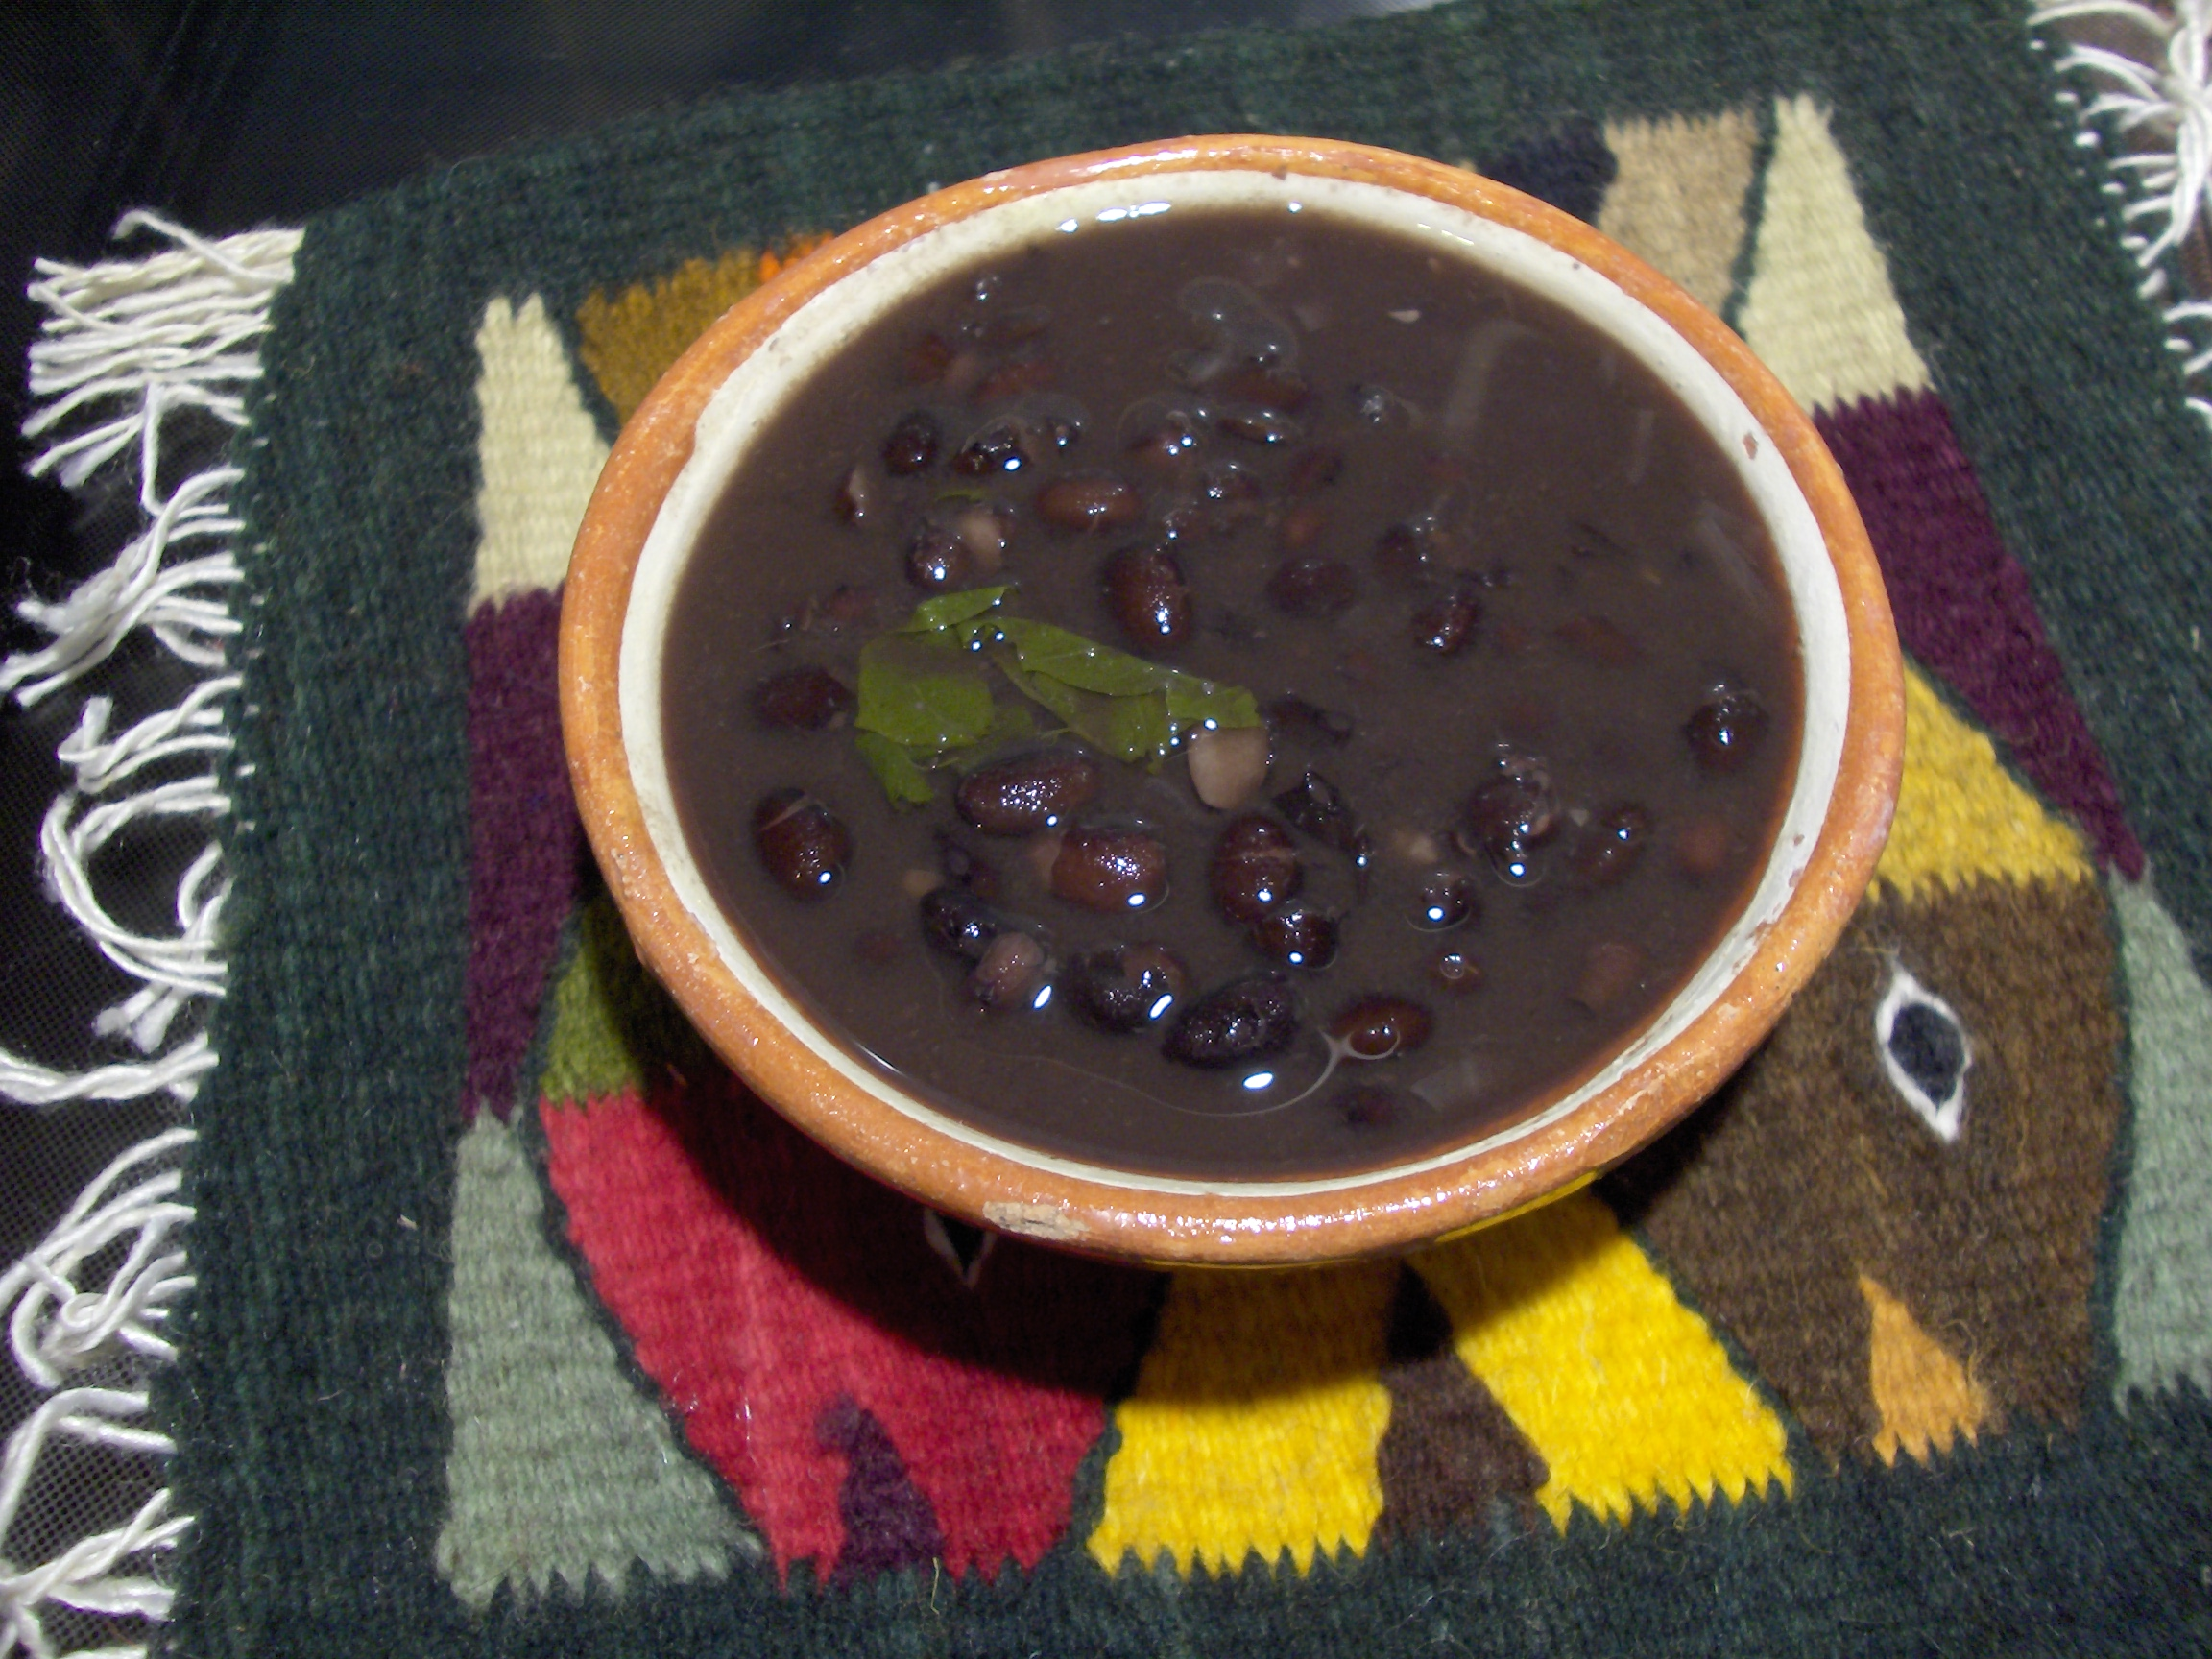 Cooking beans in crock pot